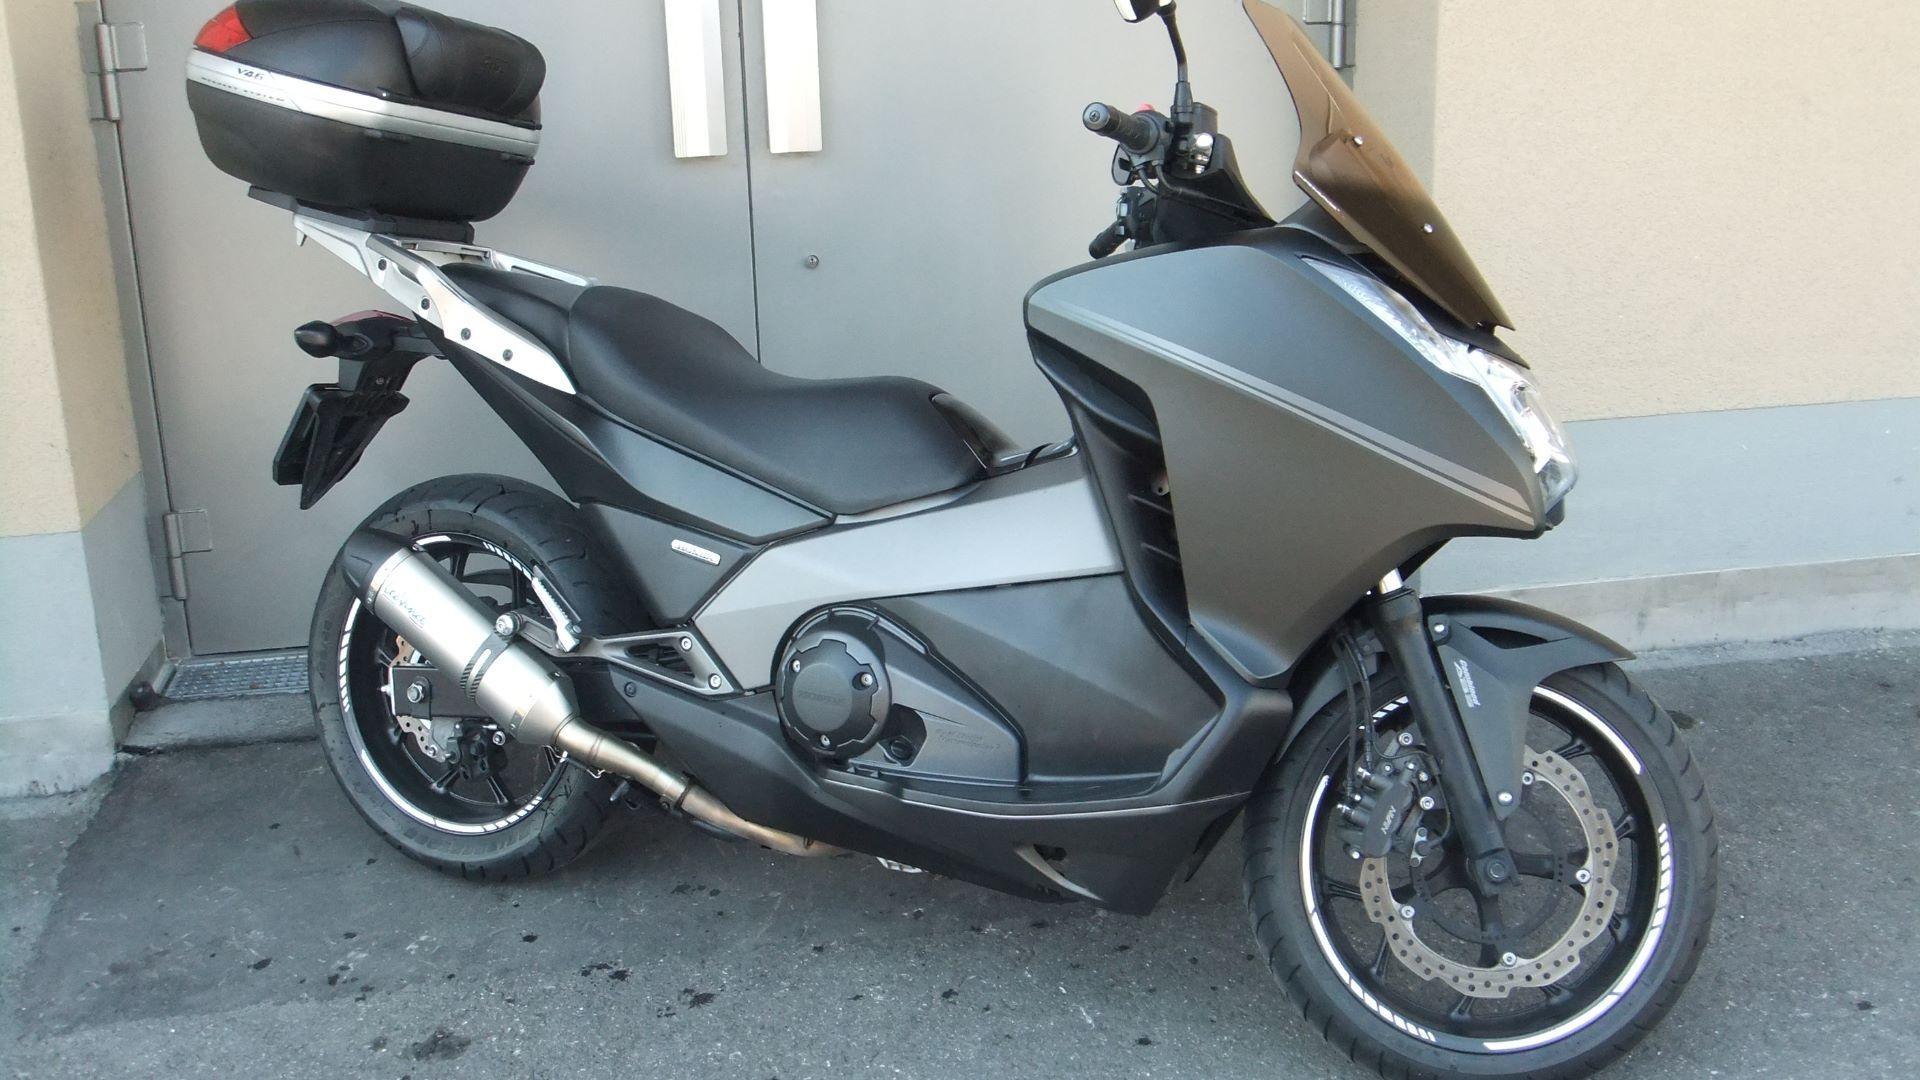 motorrad occasion kaufen honda nc 700 d integra abs moto burch k giswil. Black Bedroom Furniture Sets. Home Design Ideas